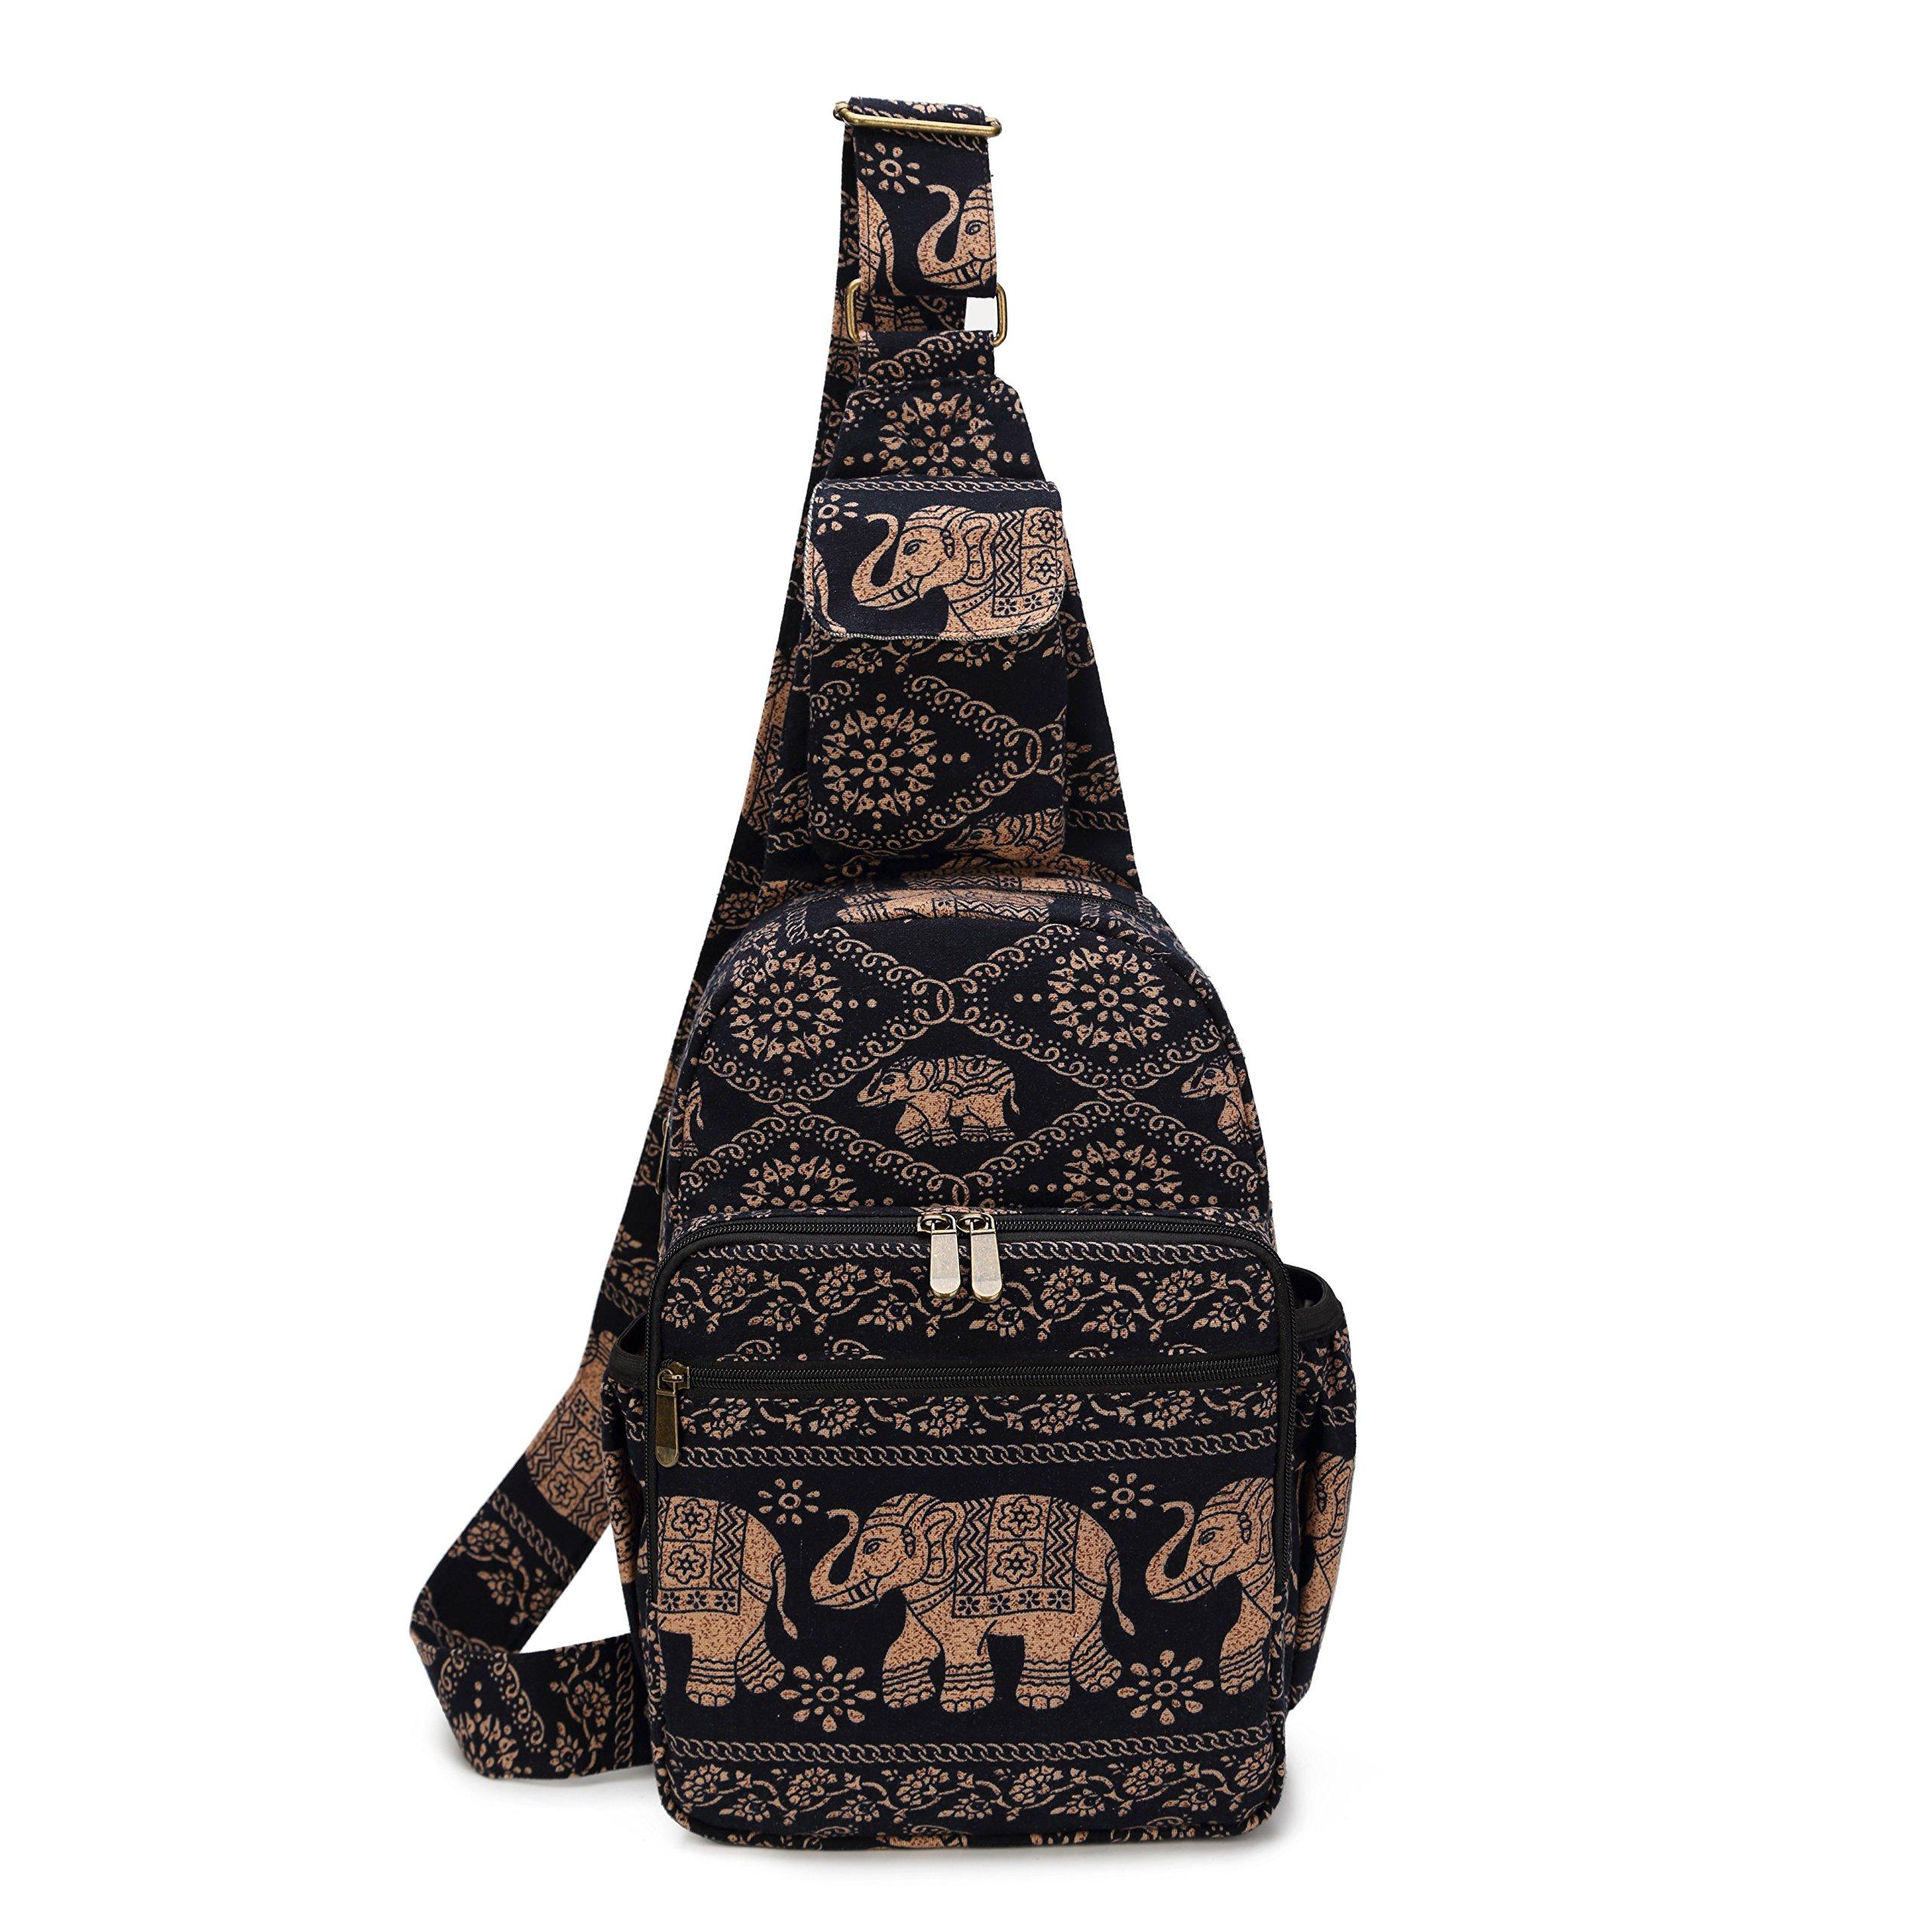 MIANZI Women Sling Bag Outdoor Sport Canvas Large capacity Crossbody Shoulder Cotton Fashion Backpack (Black)